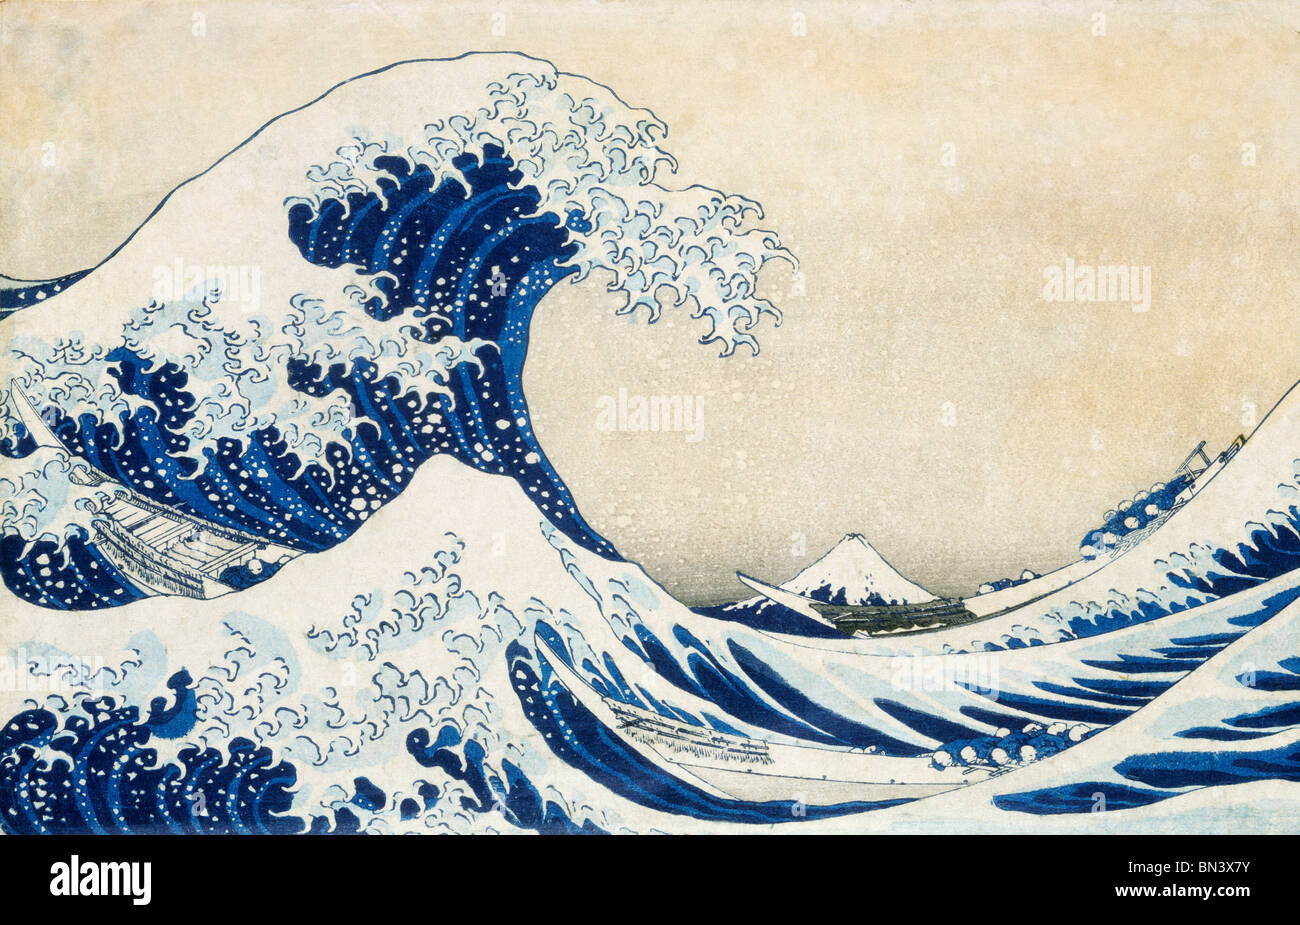 The Great Wave, by Katsushika Hokusai. Japan, 19th century Stock Photo